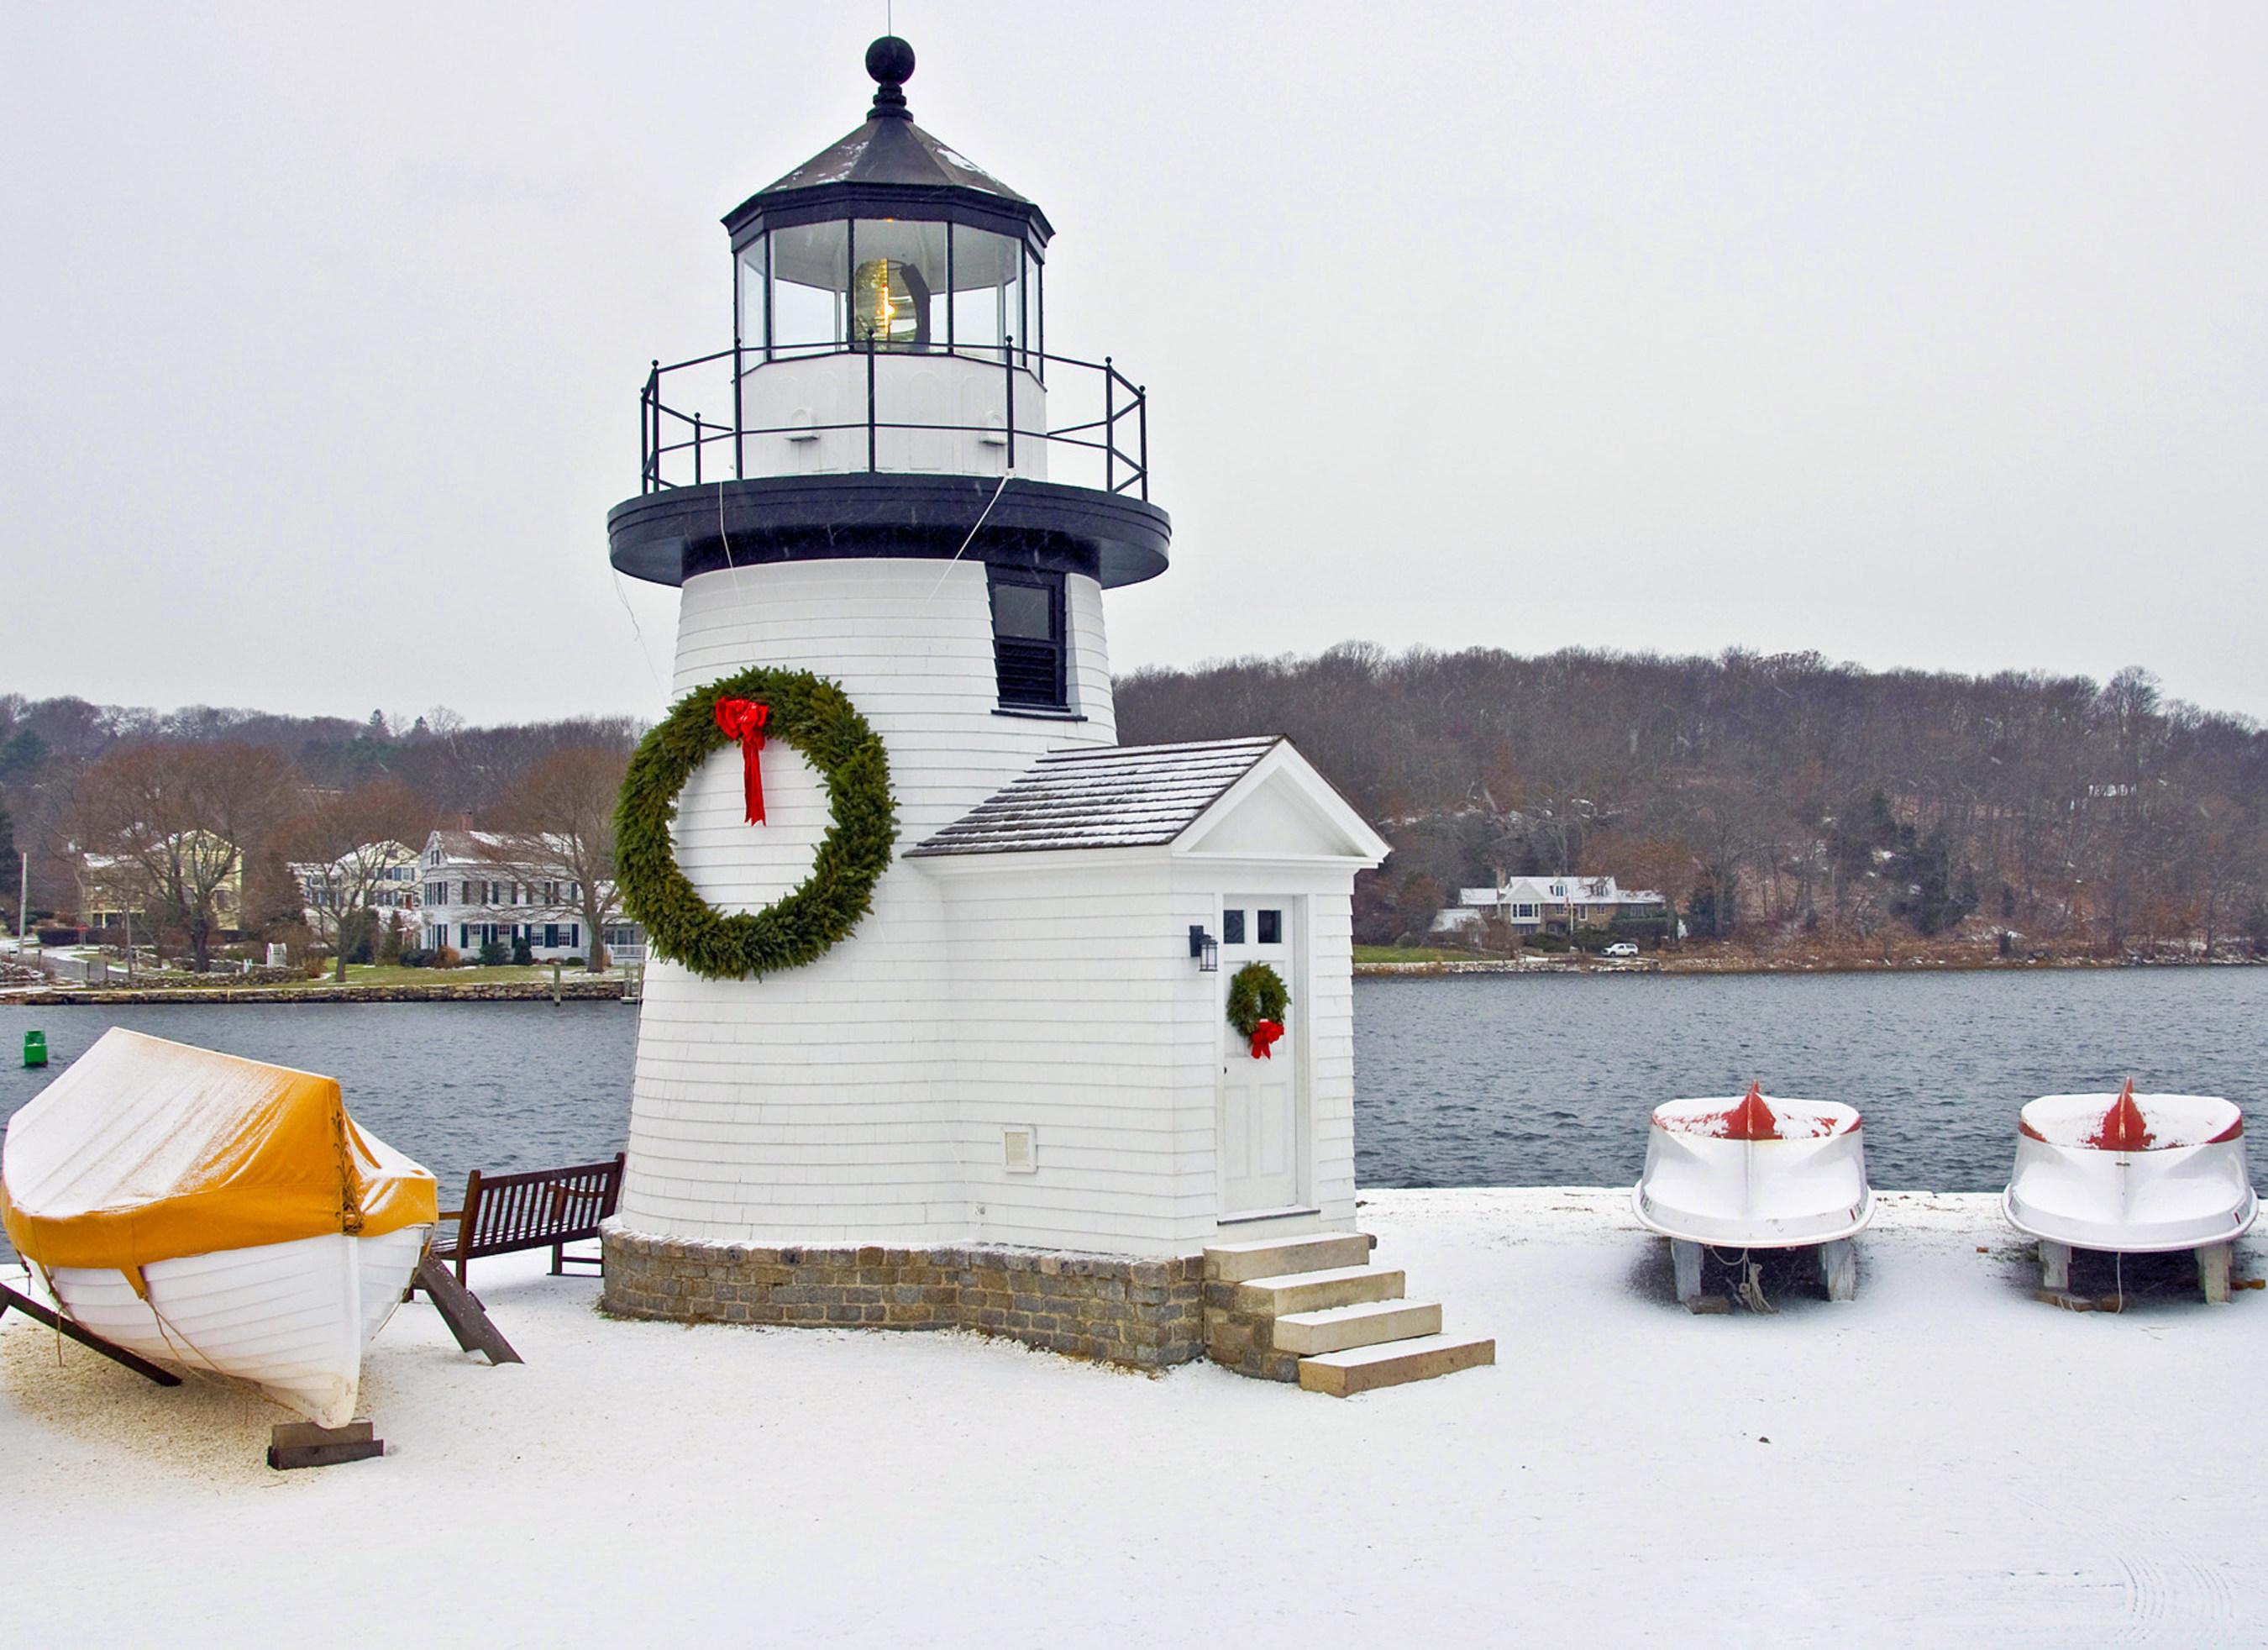 Mystic Seaport Lighthouse, Mystic, Conn. Courtesy of Mystic Seaport.